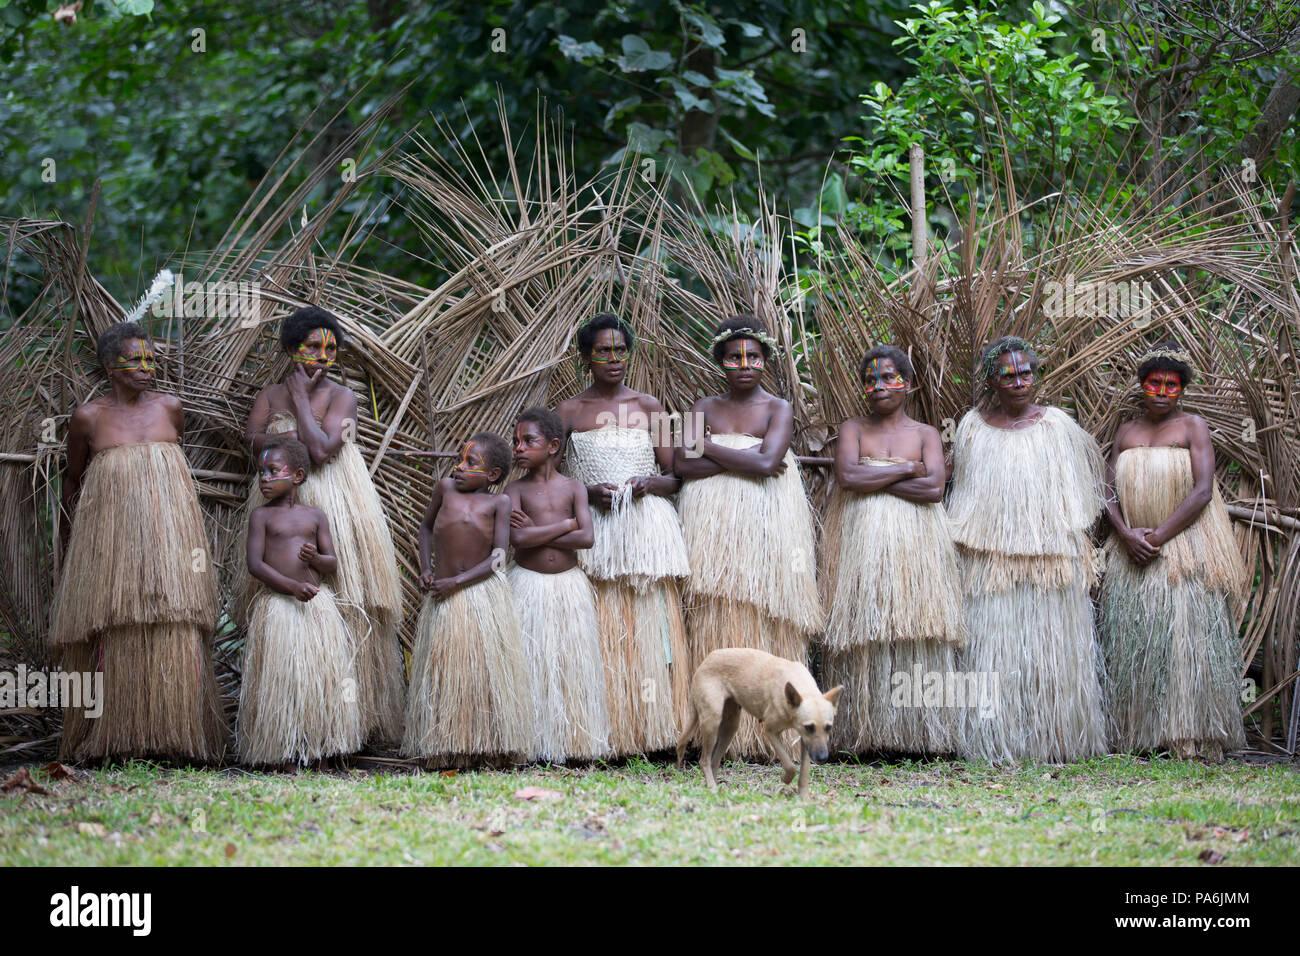 Sections locales en costumes traditionnels, Tanna, Vanuatu Photo Stock